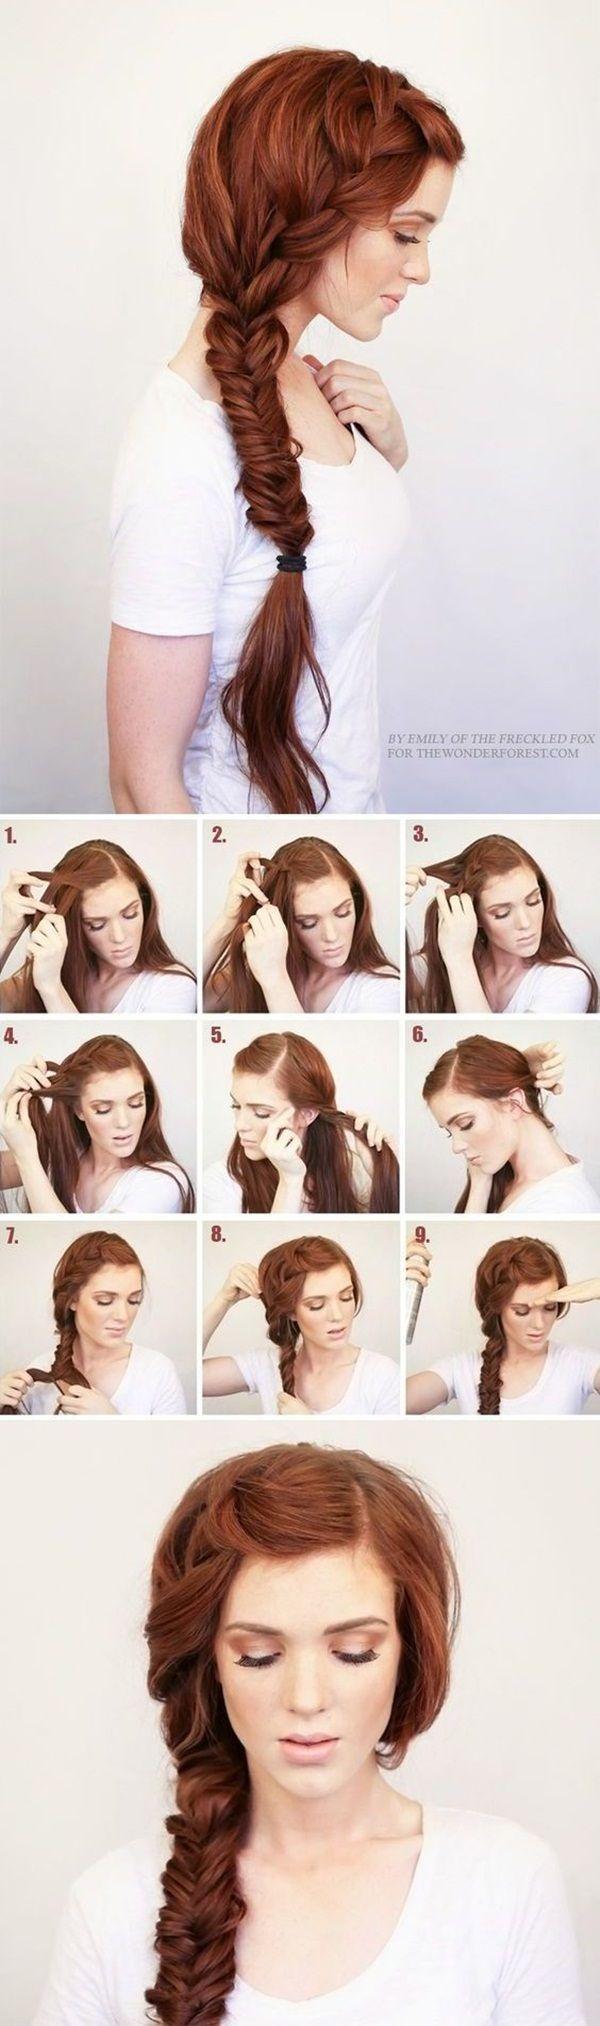 Easy hairstyles for school nail design nail art nail salon